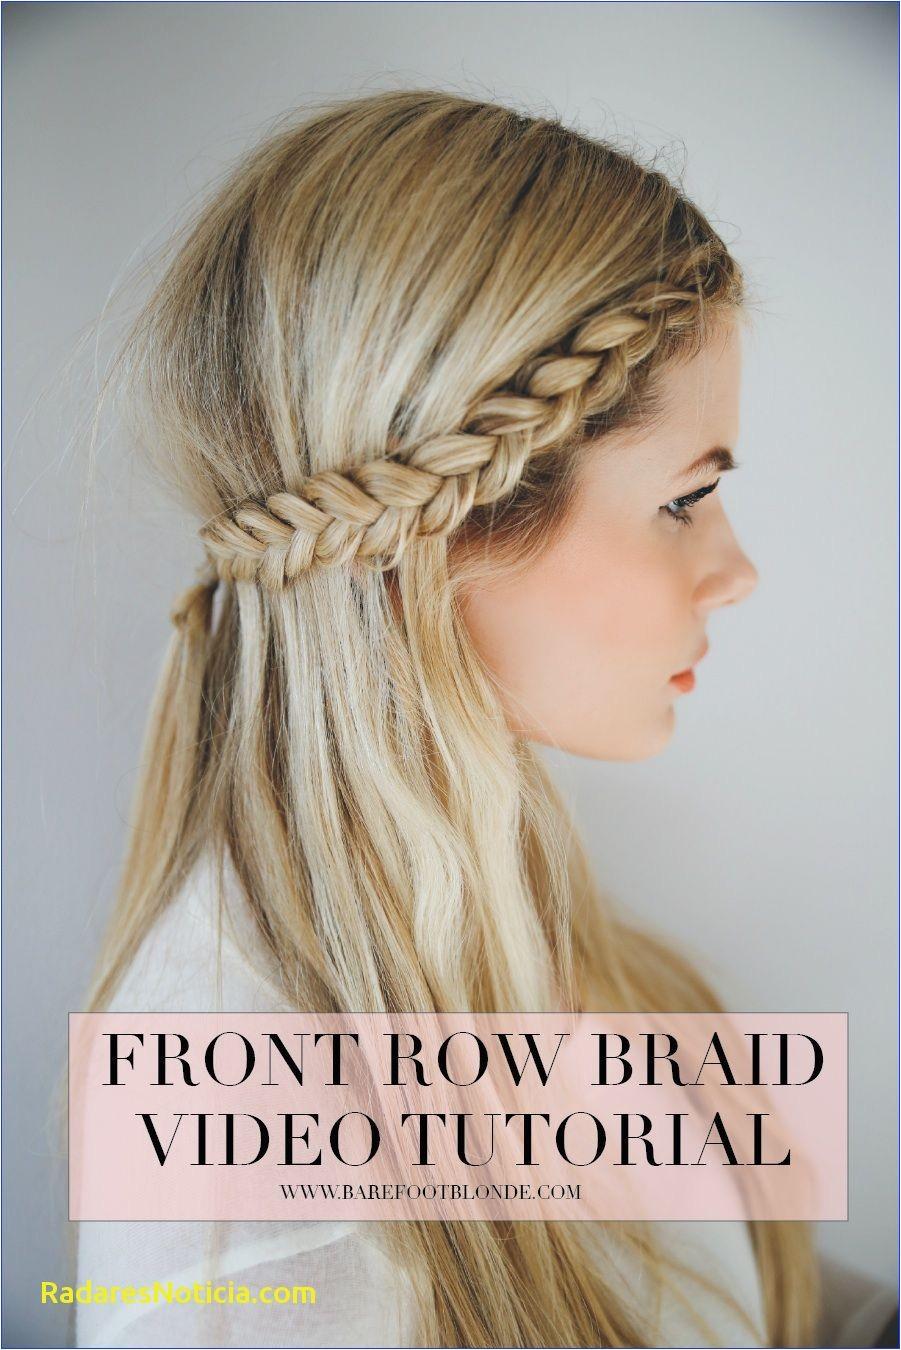 Front Row Braid Video Tutorial Half up Half down Hairstyles Rose Gold Hair Blonde